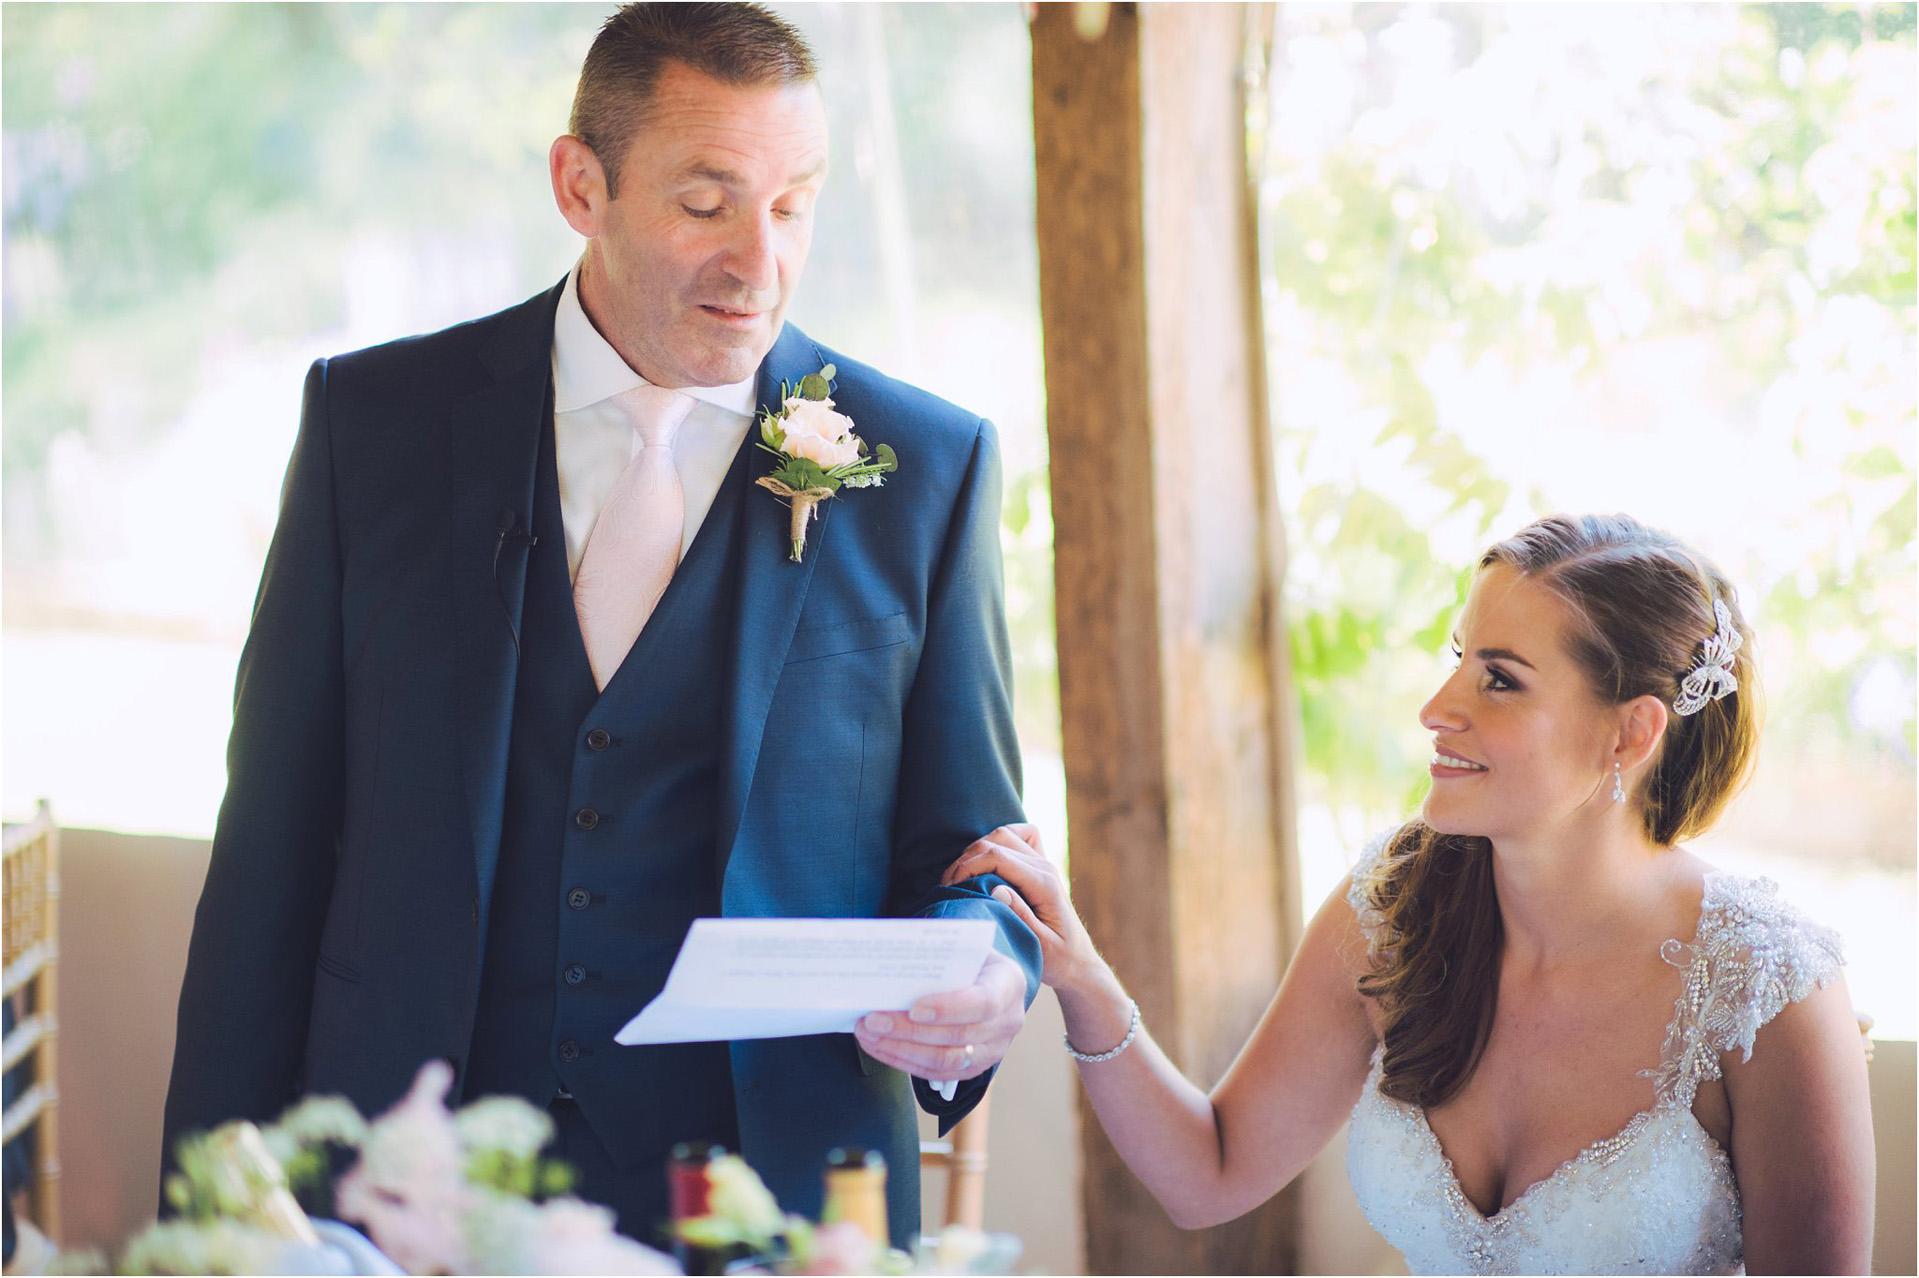 Simon biffen wedding photography 0111